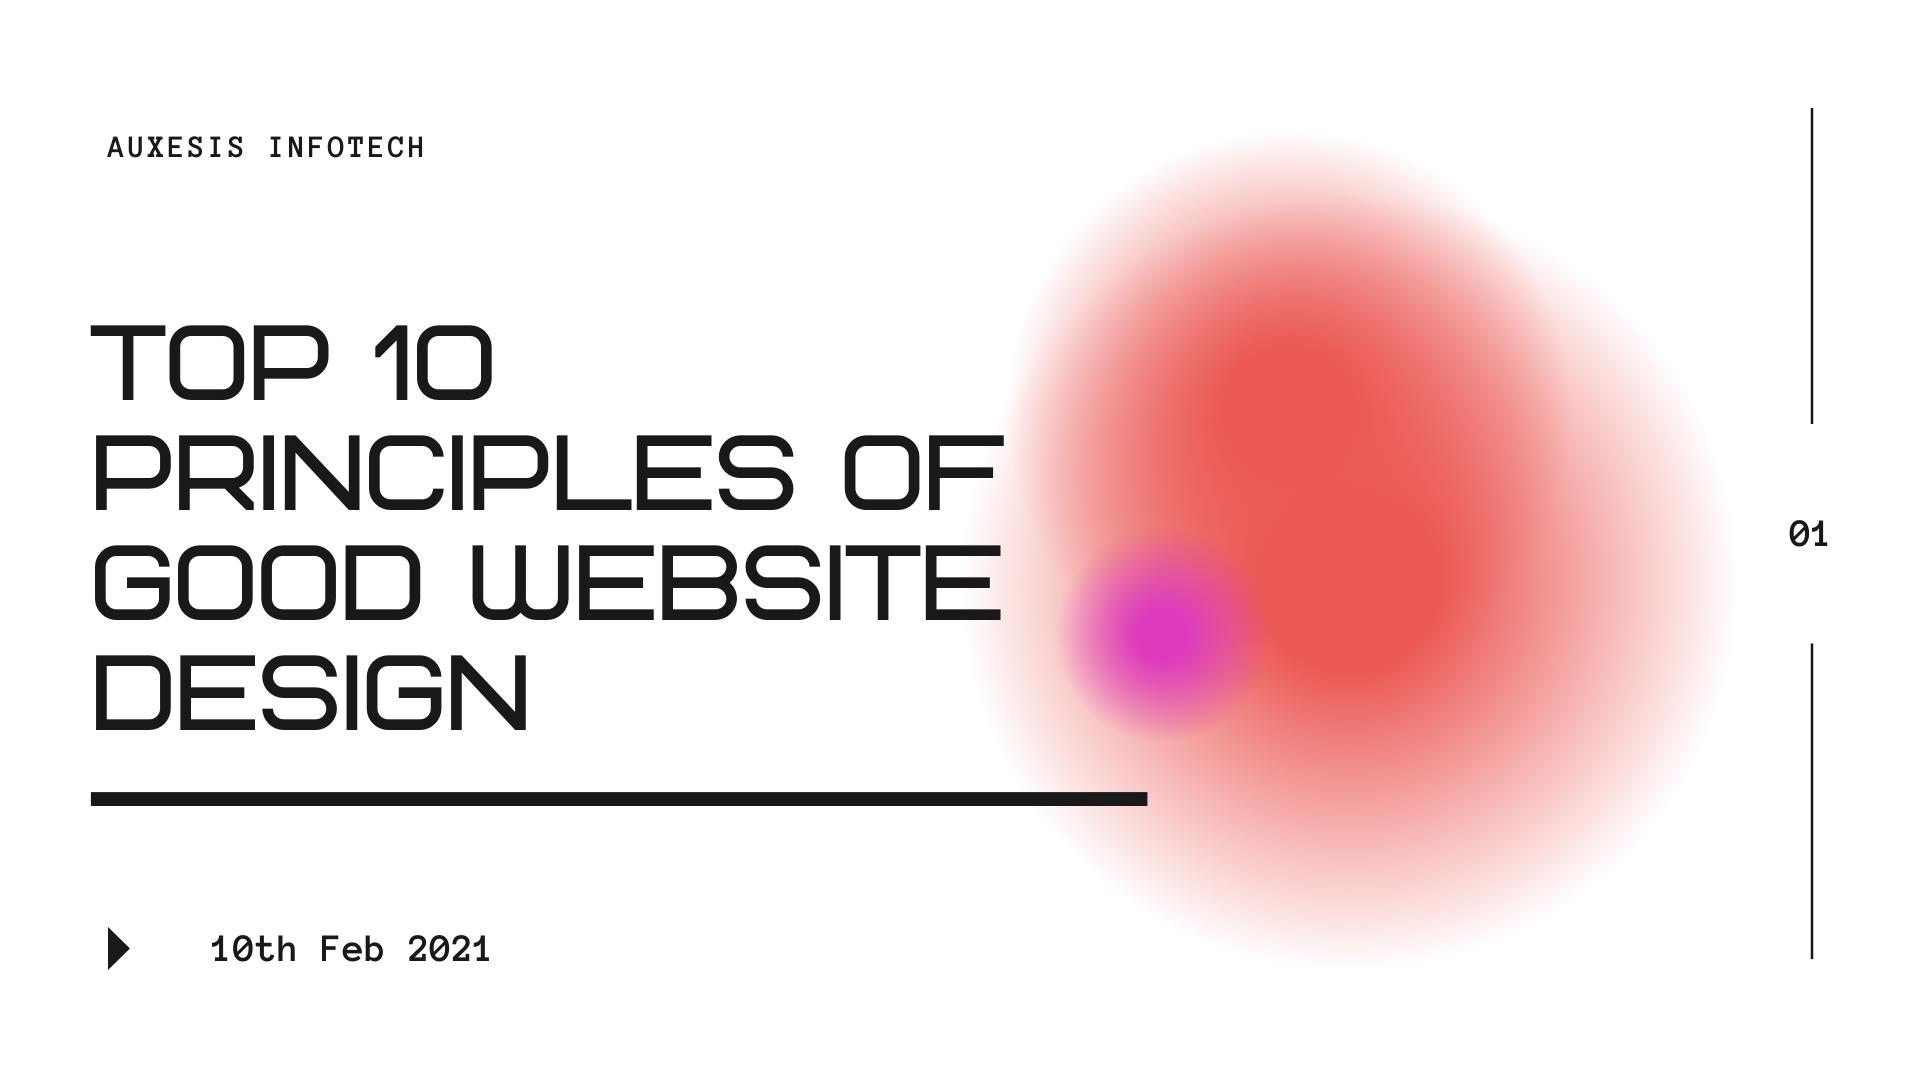 Top 10 Principles Of Good Website Design